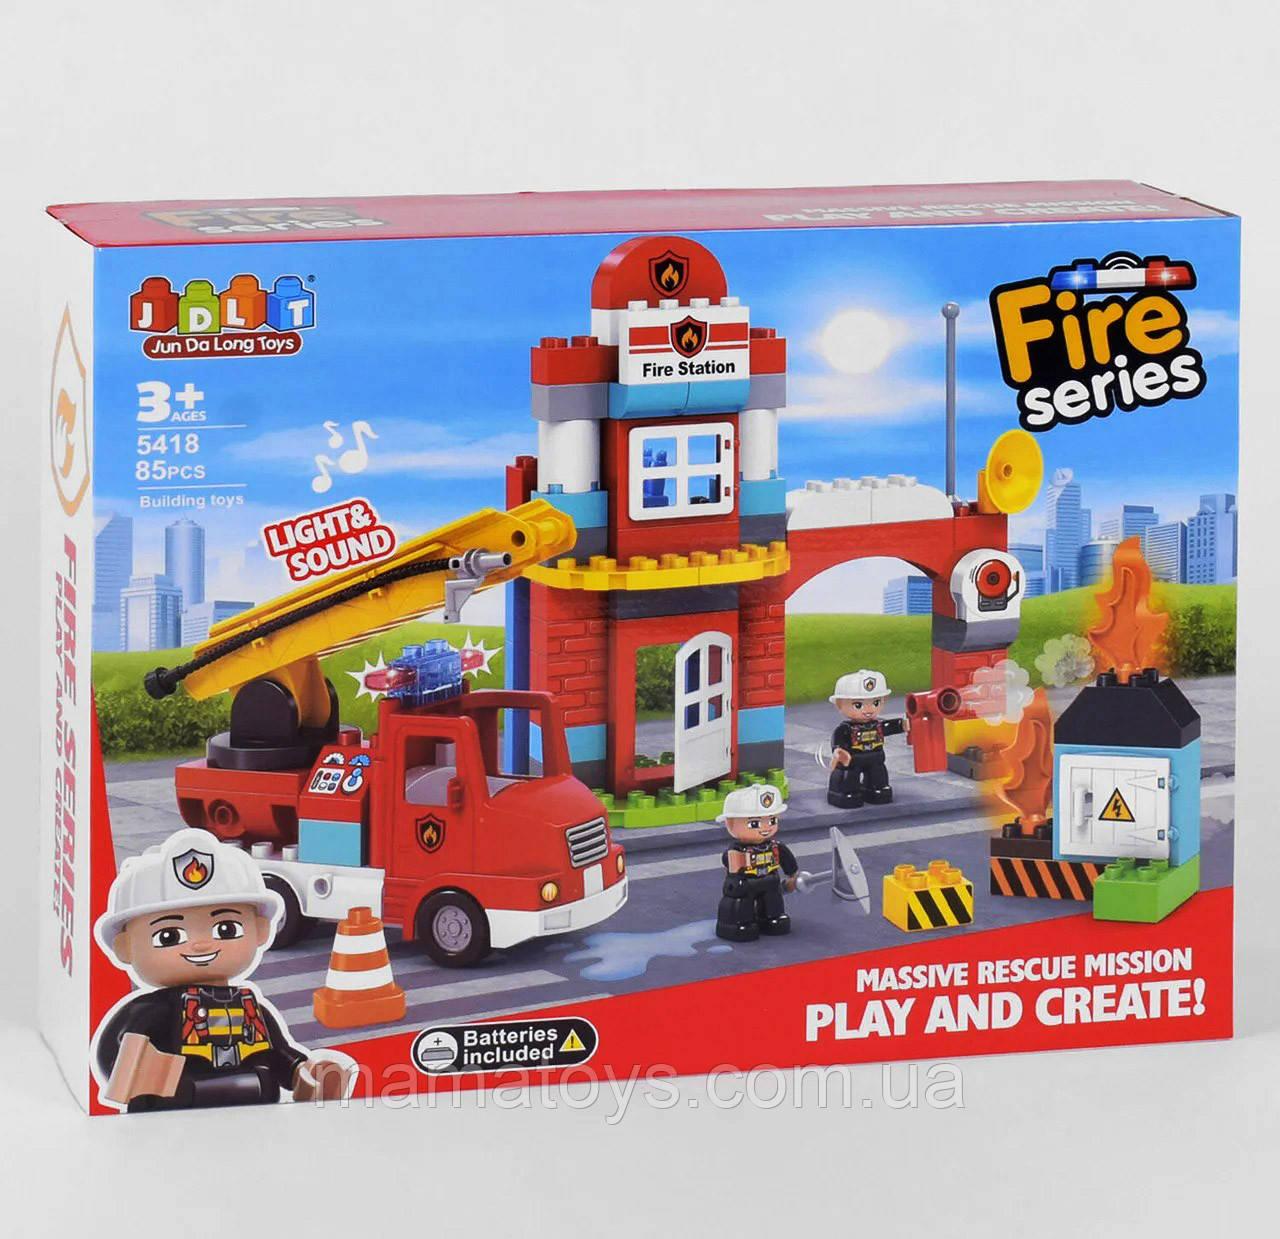 Дитячий Конструктор JDLT 5418 Пожежна станція 85 деталей, світло, звук